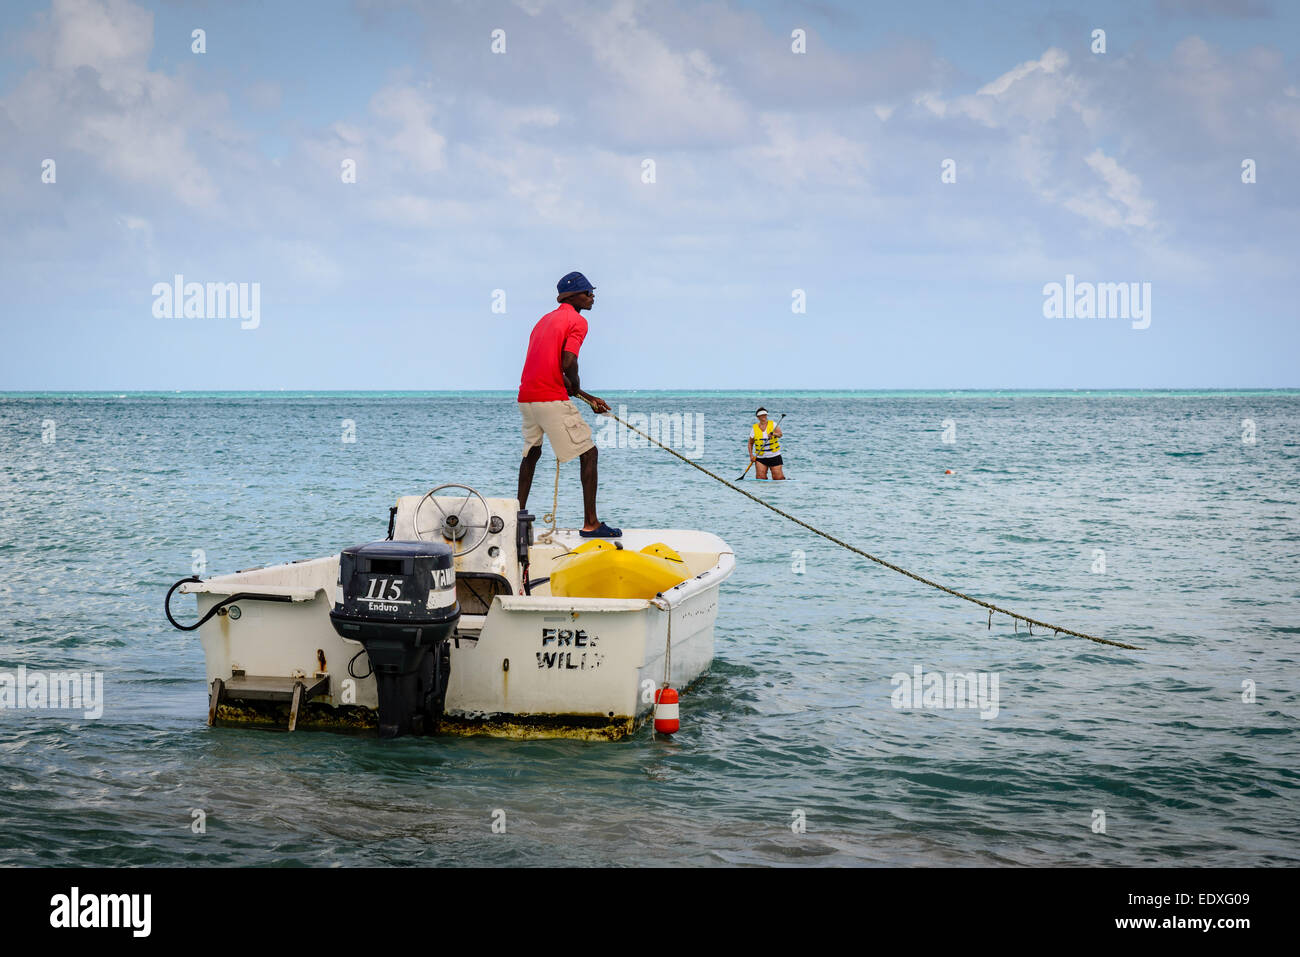 67f67333b46b3 Sandals Grande Antigua Resort Dive Boat Service Skiff